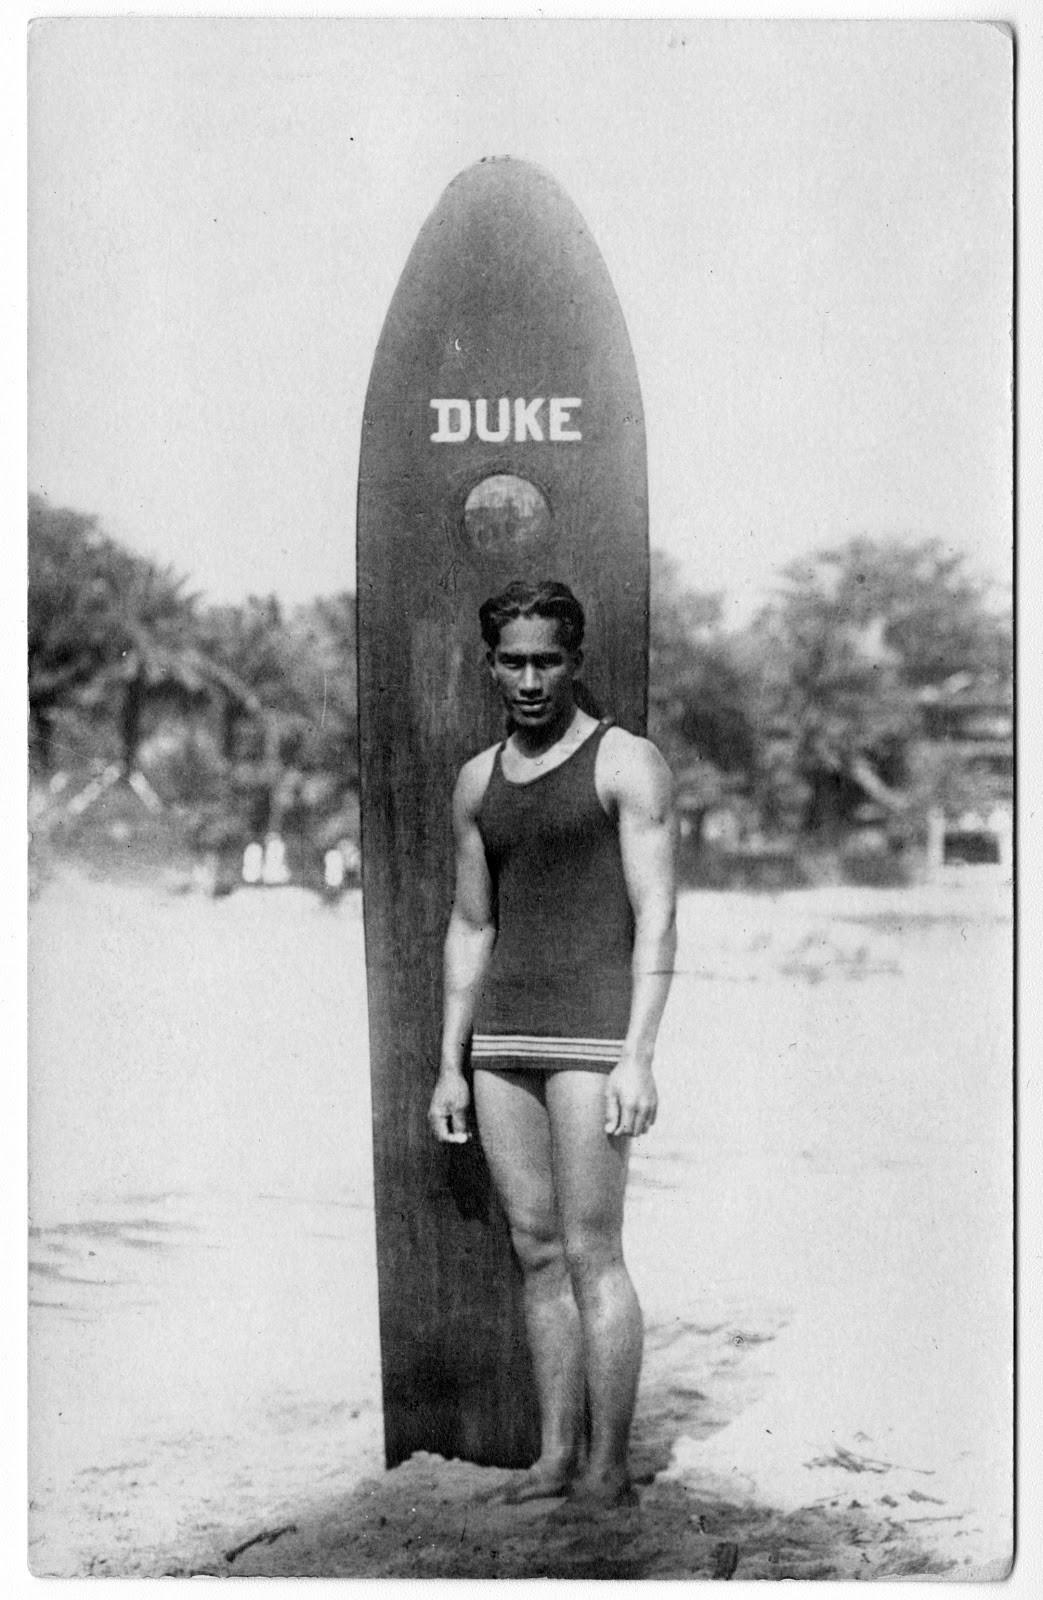 Image of Duke Kahanamoku with surfboard